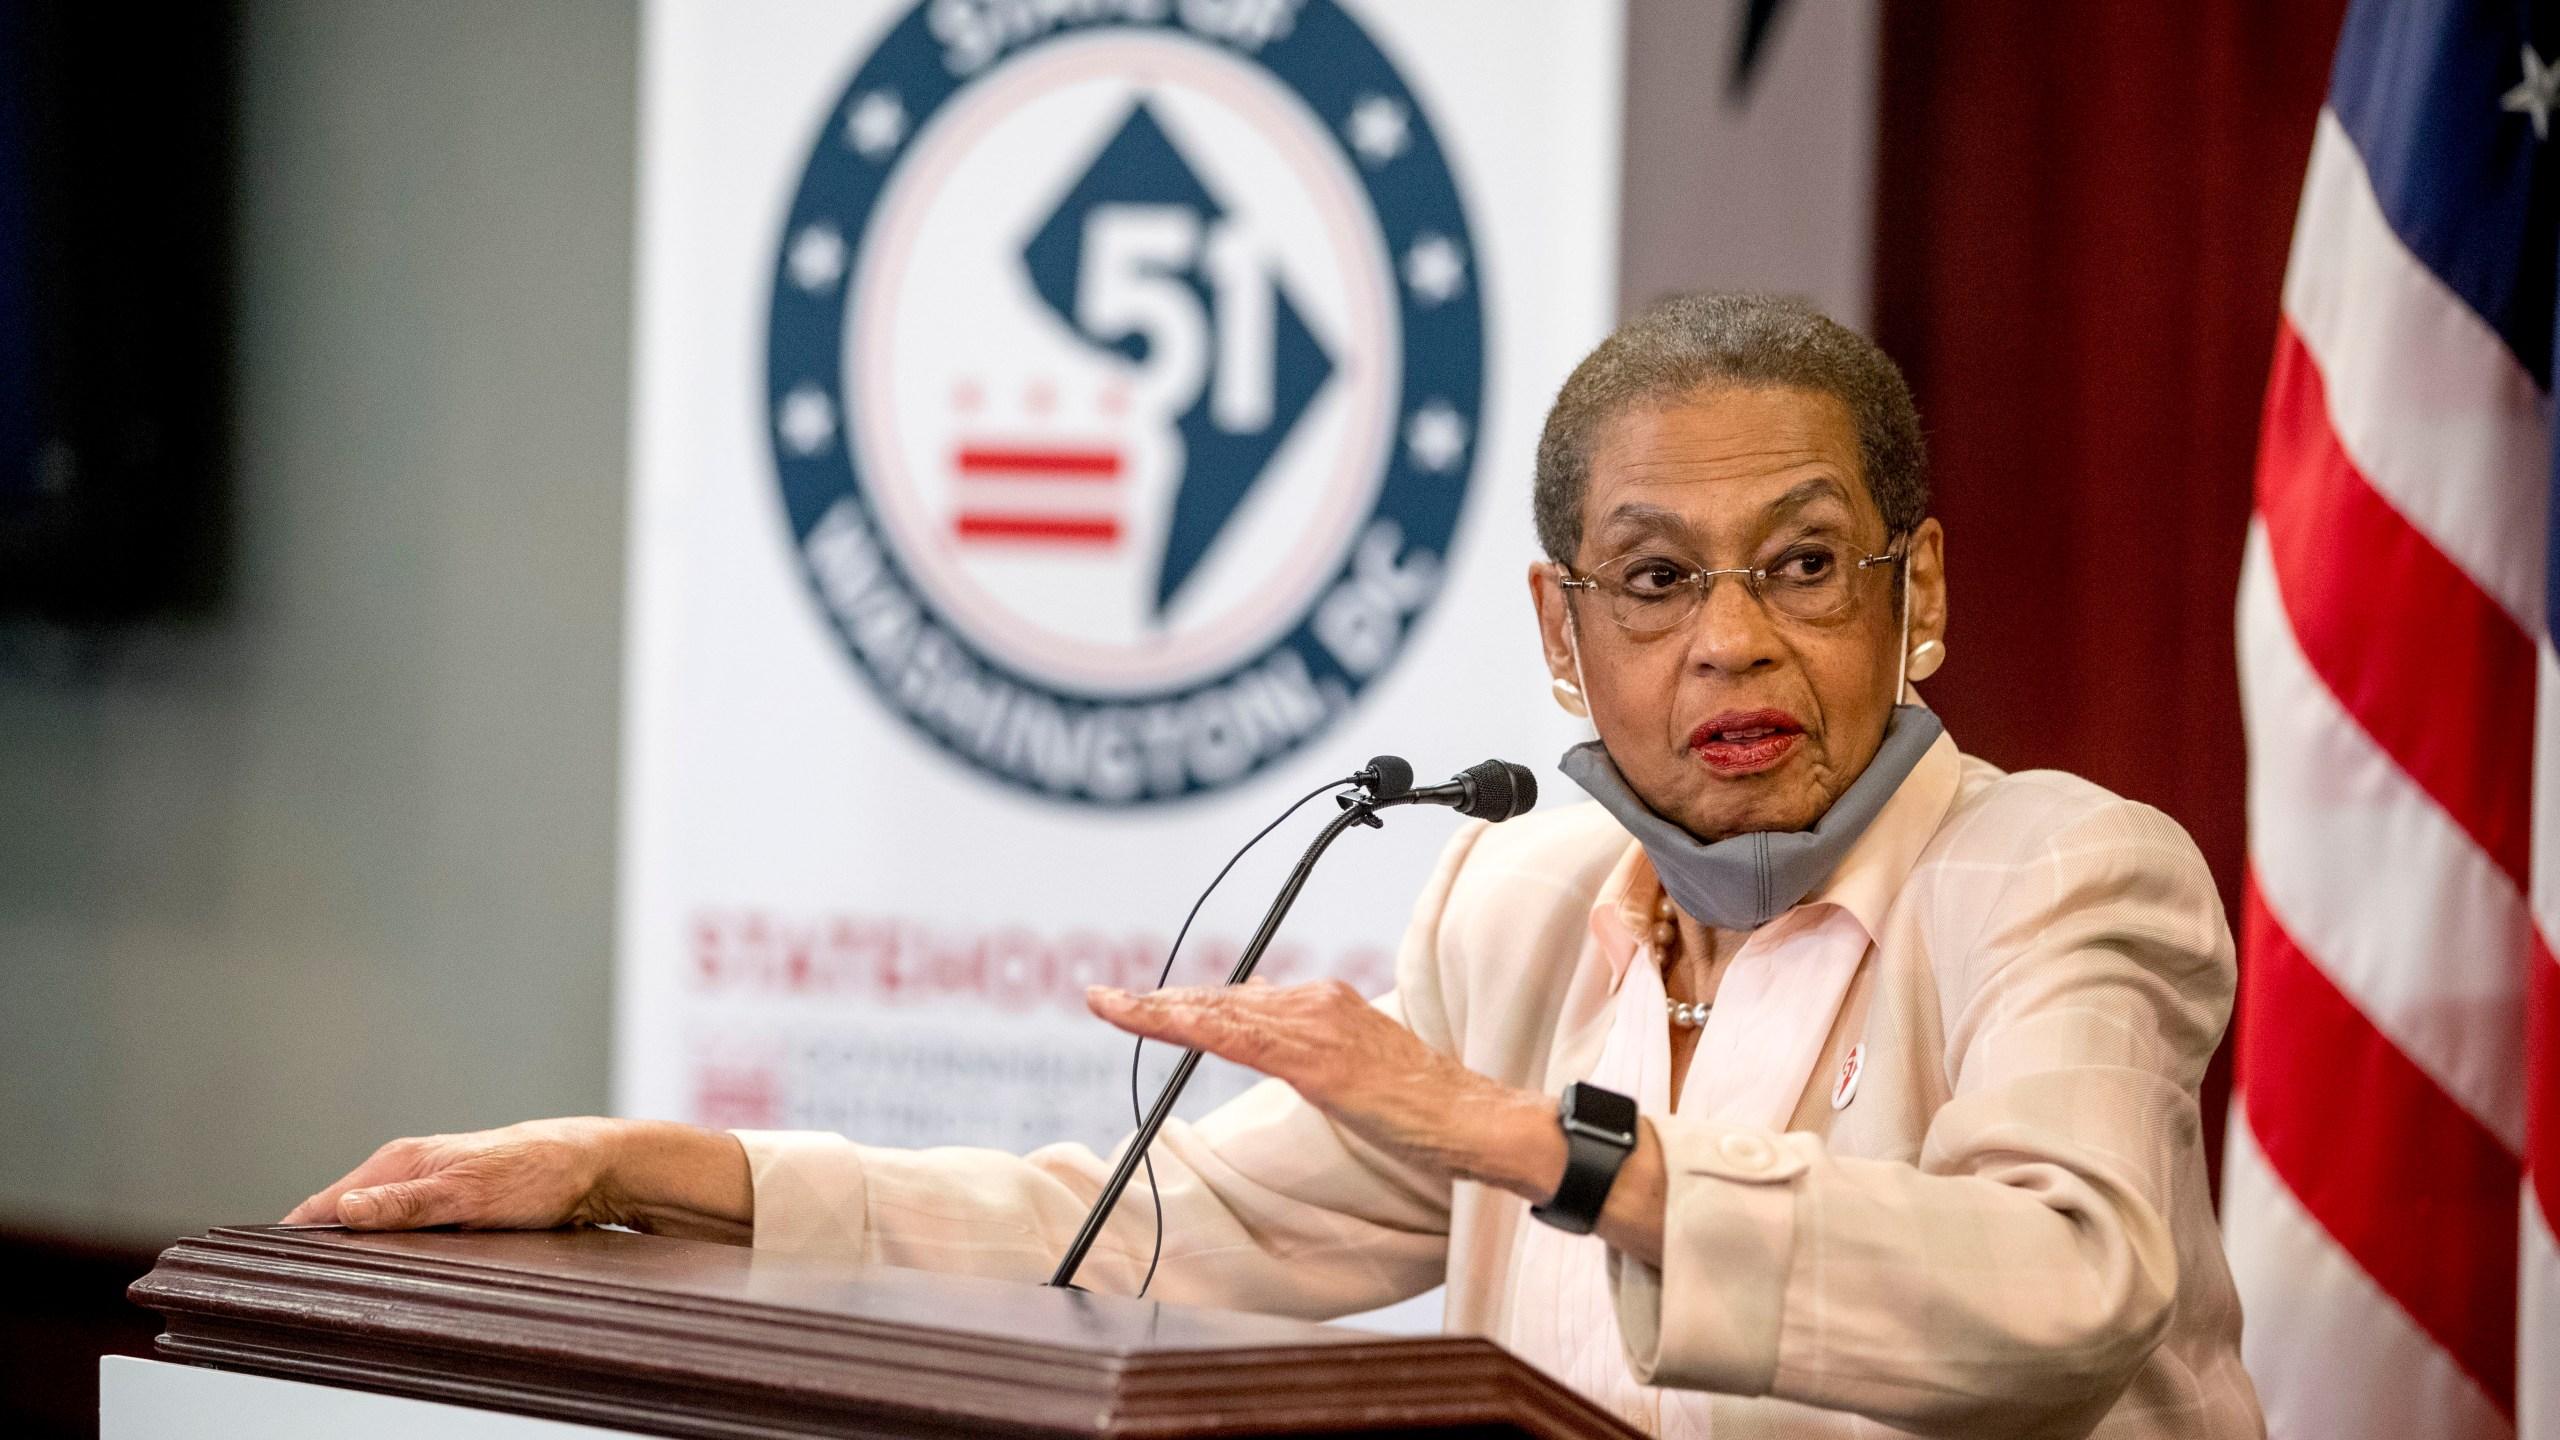 Congresswoman Norton introduces D.C. statehood bill | WDVM25 & DCW50 | Washington, DC